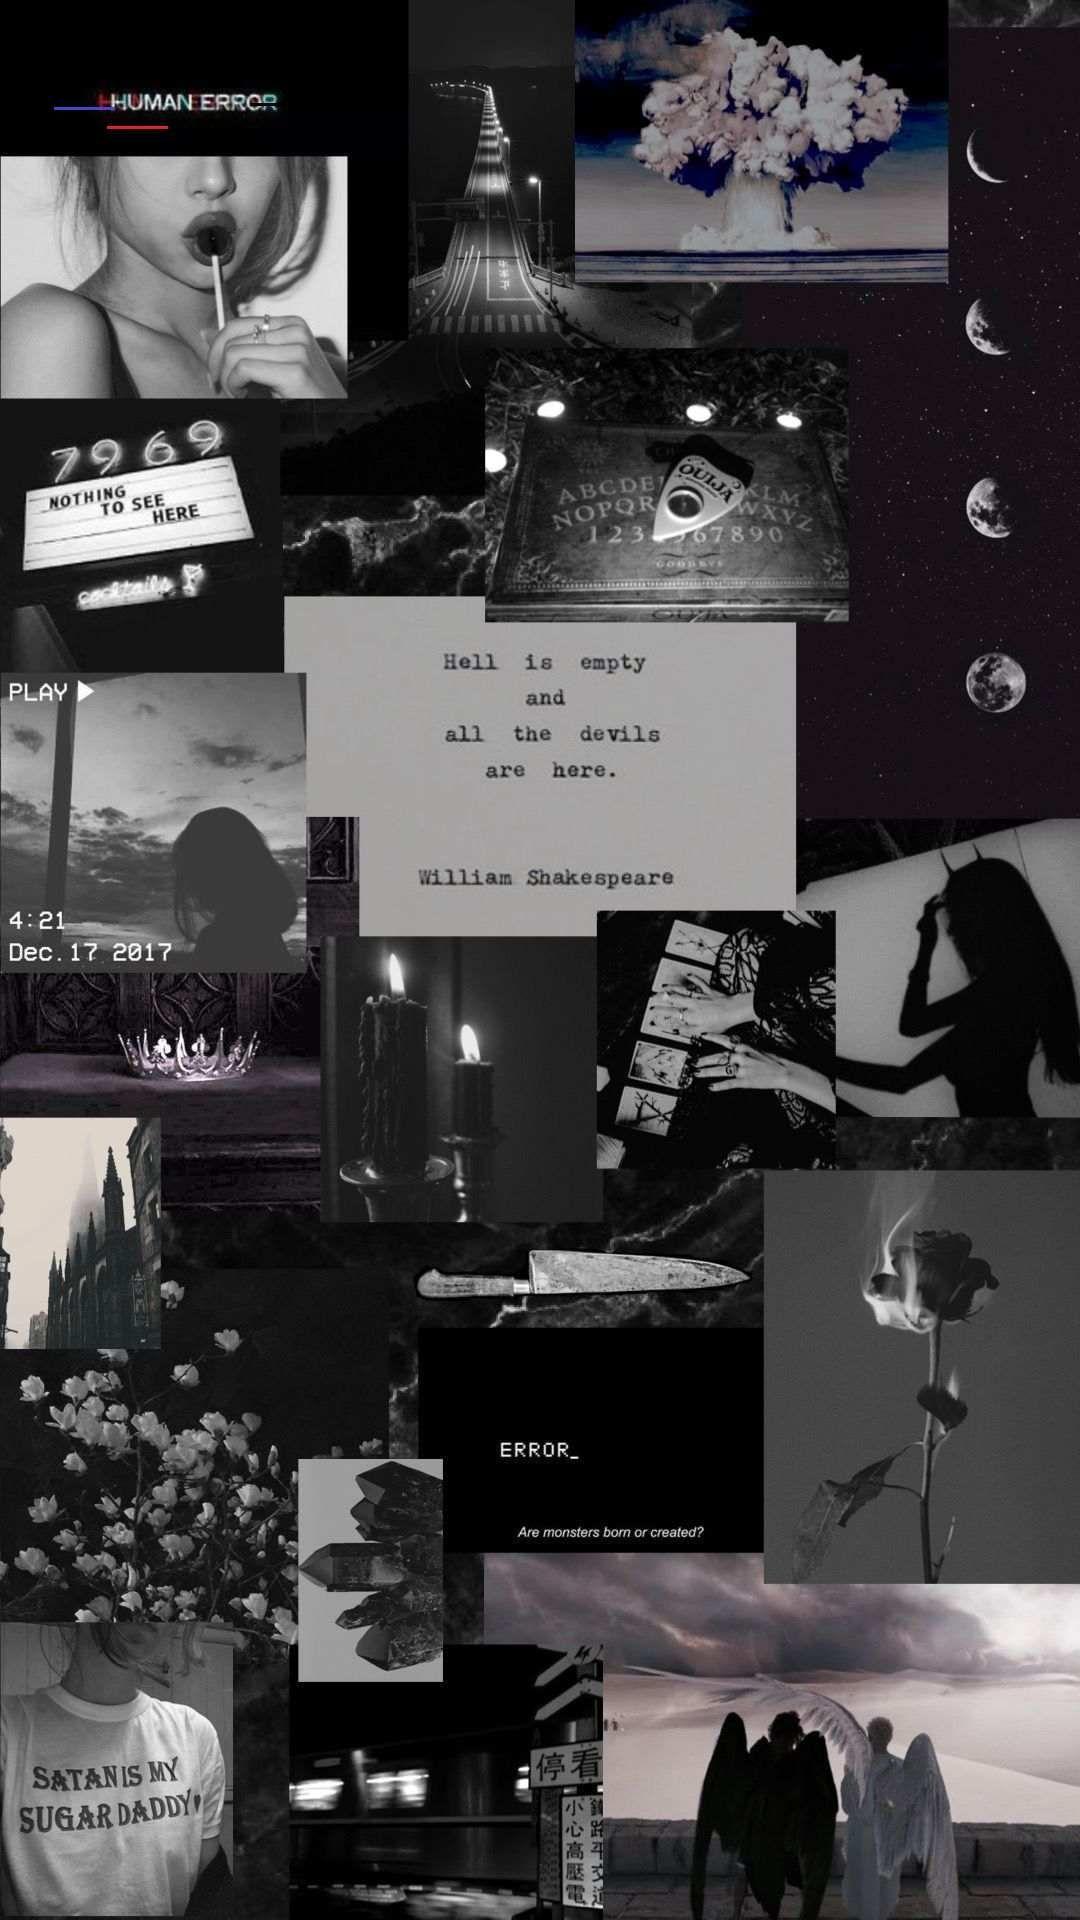 Grunge Edgy Wallpaper : grunge, wallpaper, Laptop, Wallpapers, Aesthetic, Grunge, #blackwallpaperiphone, #aesthetic, Backgroun…, Wallpaper, Edgy,, Gelap,, Estetika